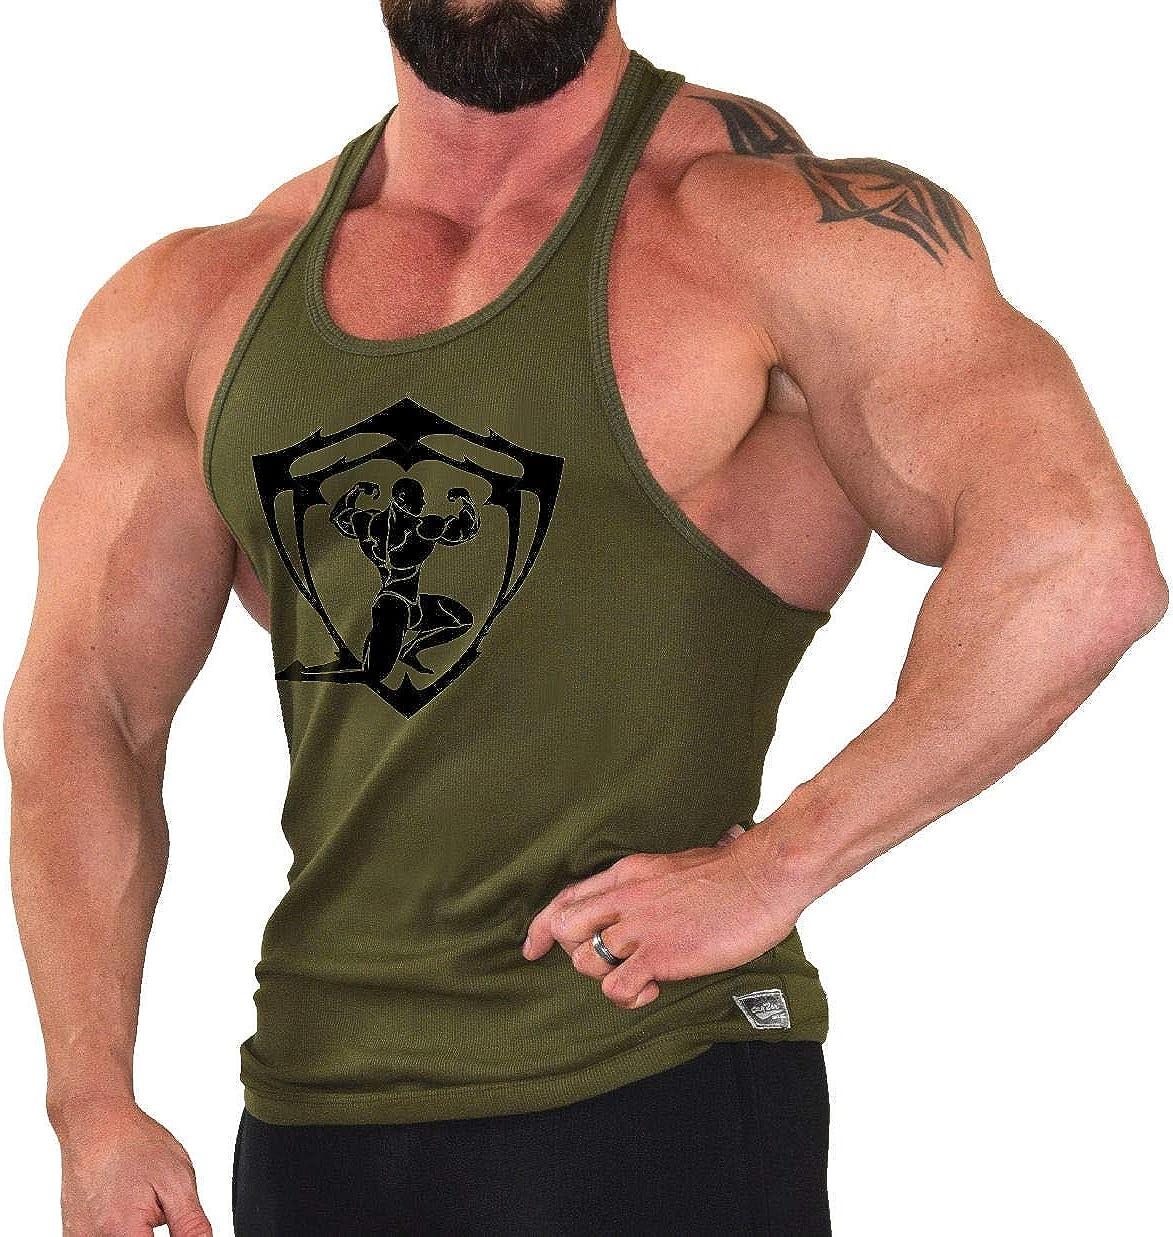 Crown Designs Crossfit Spartan Bodybuilding Weight-training Sports Stringer Vest Top with Y Back Racerback Fit for Men /& Teens